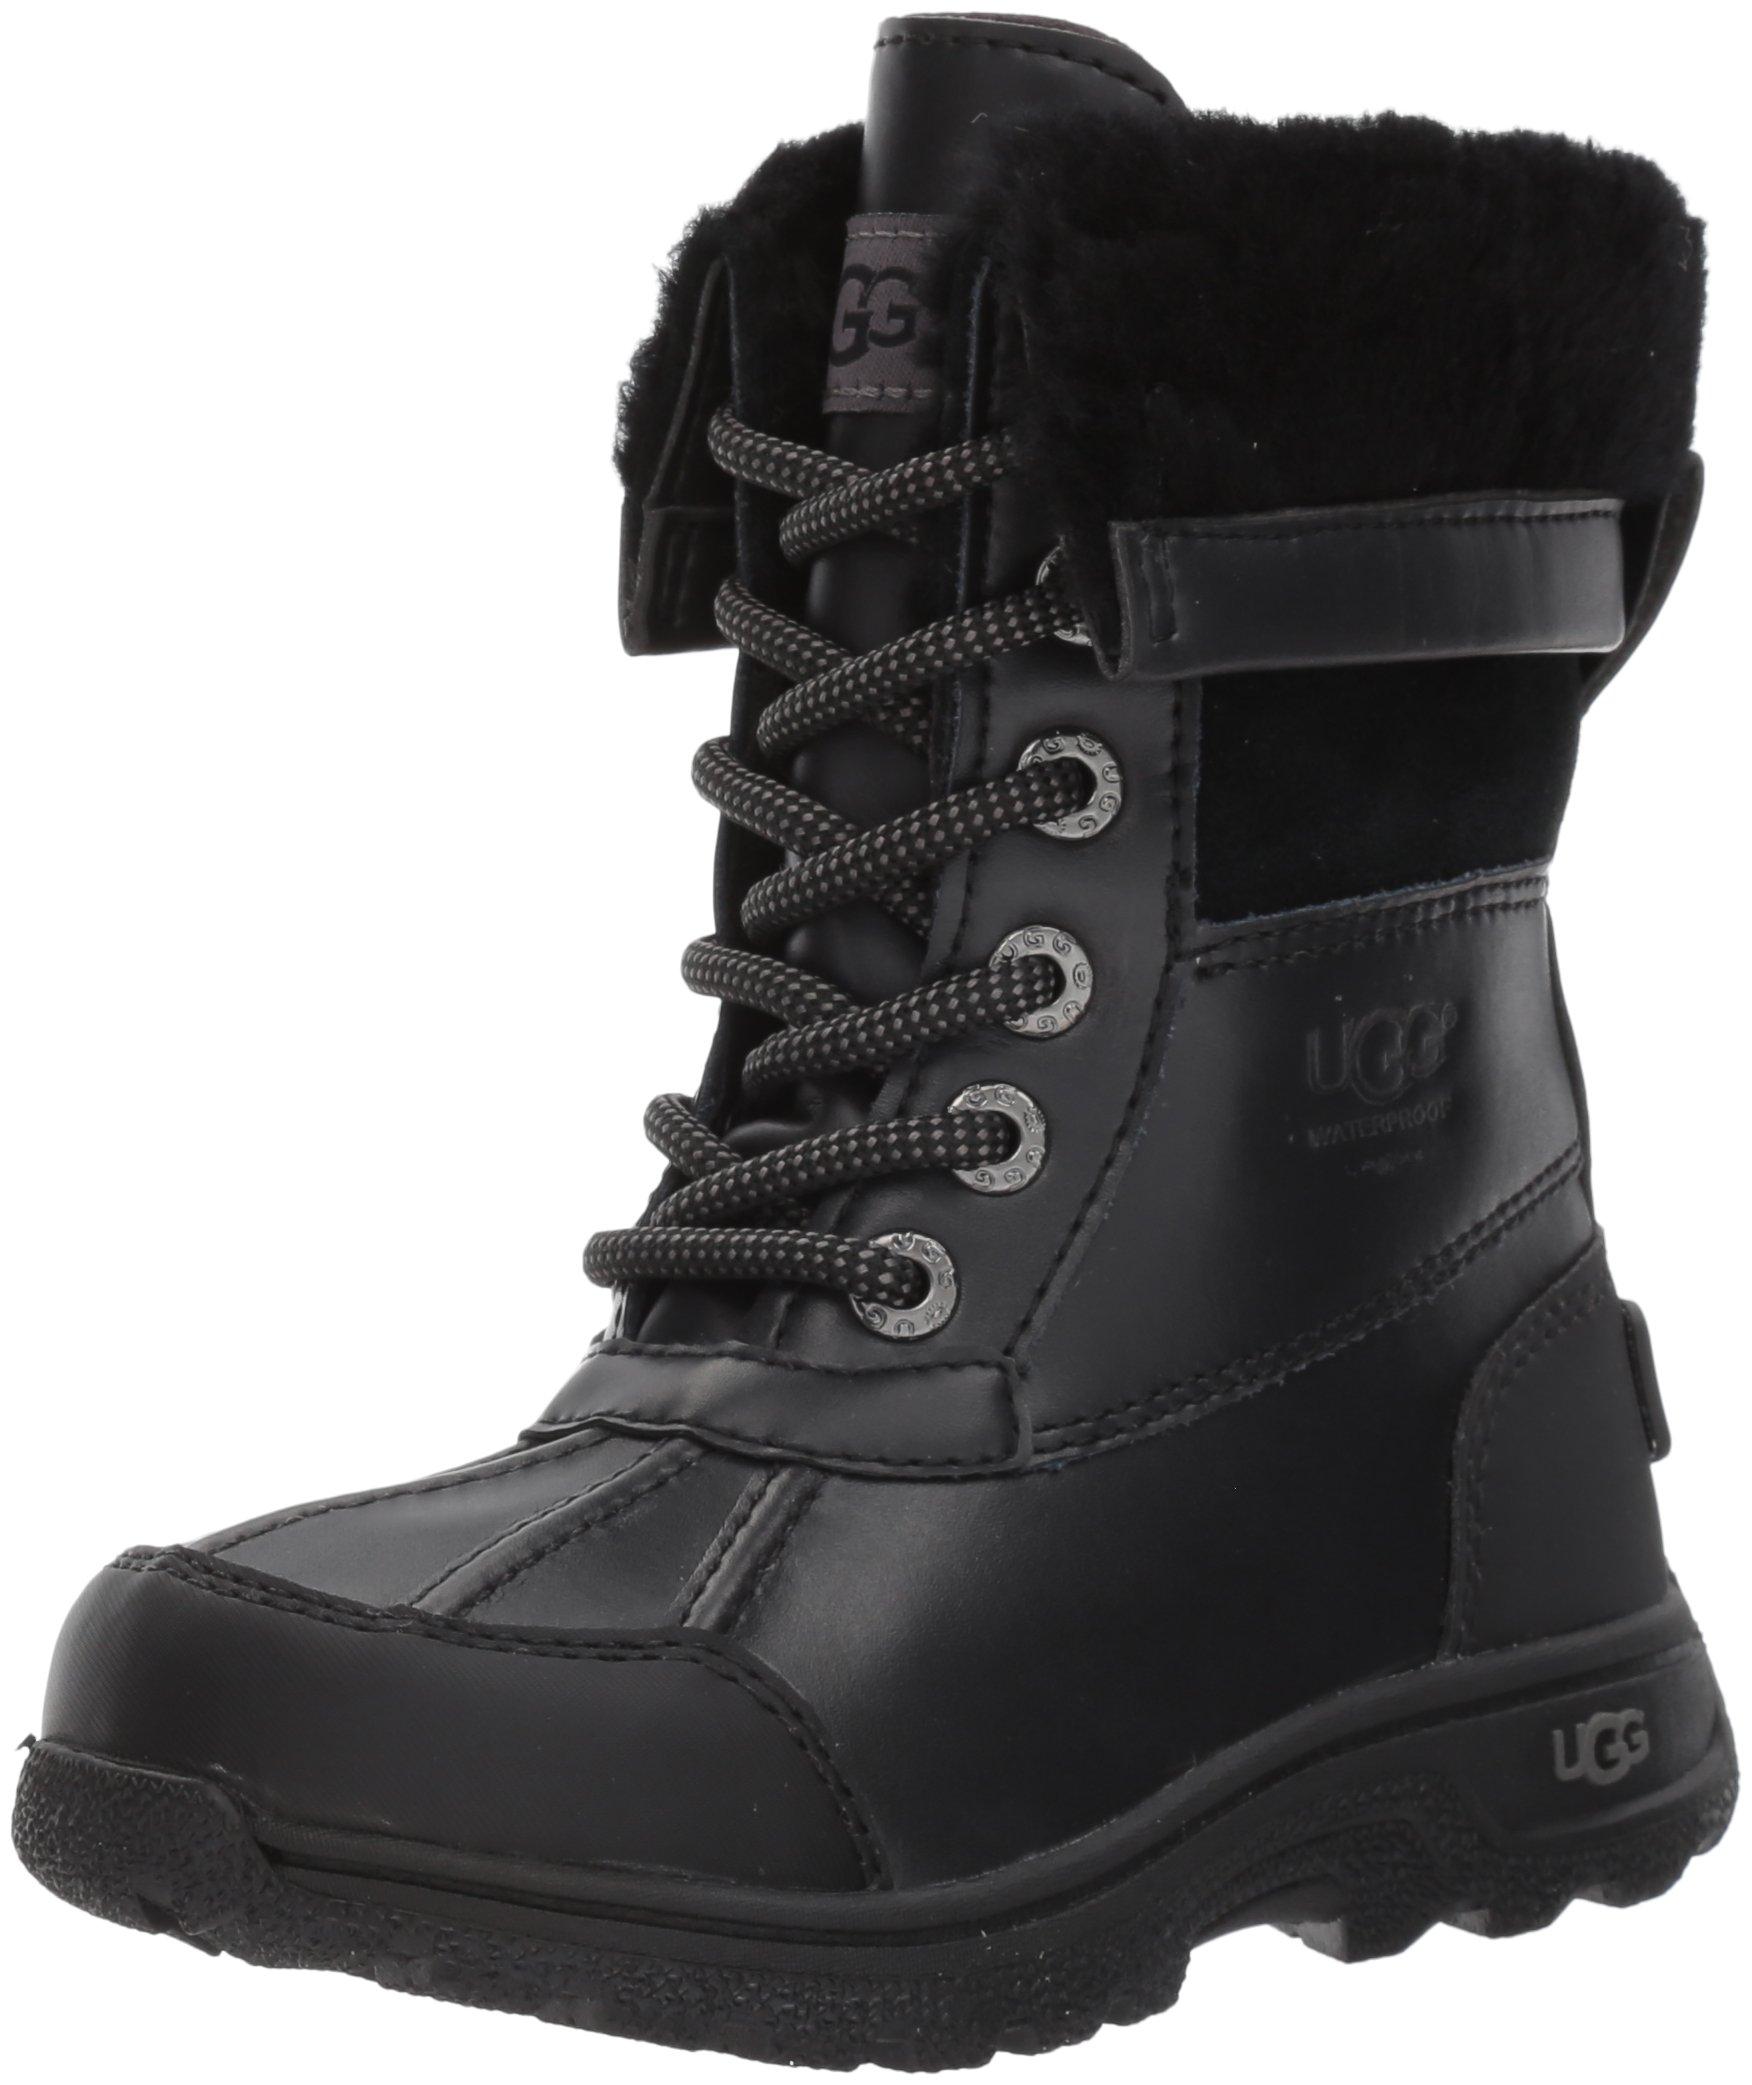 UGG Kids K Butte II Lace-up Boot, Black, 11 M US Little Kid